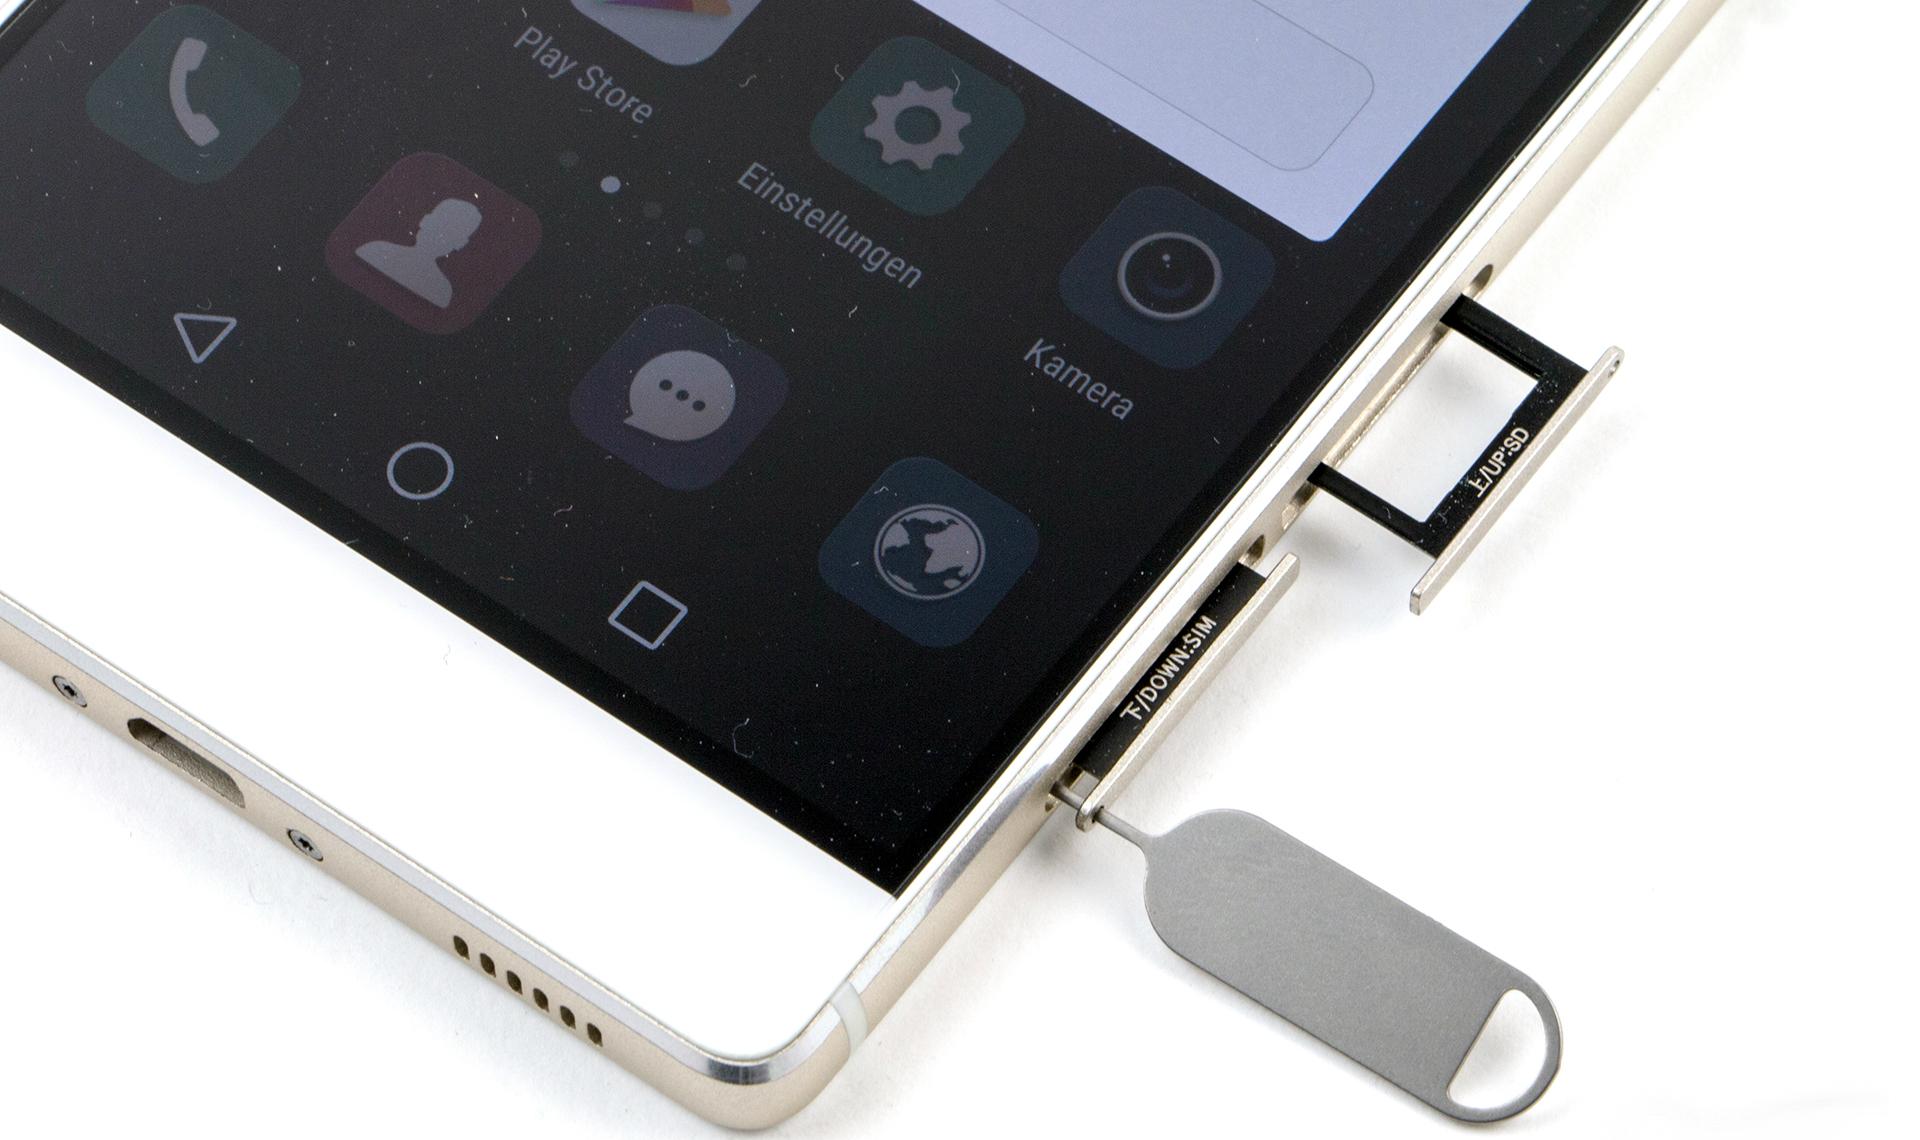 Huawei P8 tiene soporte DualSIM y microSD